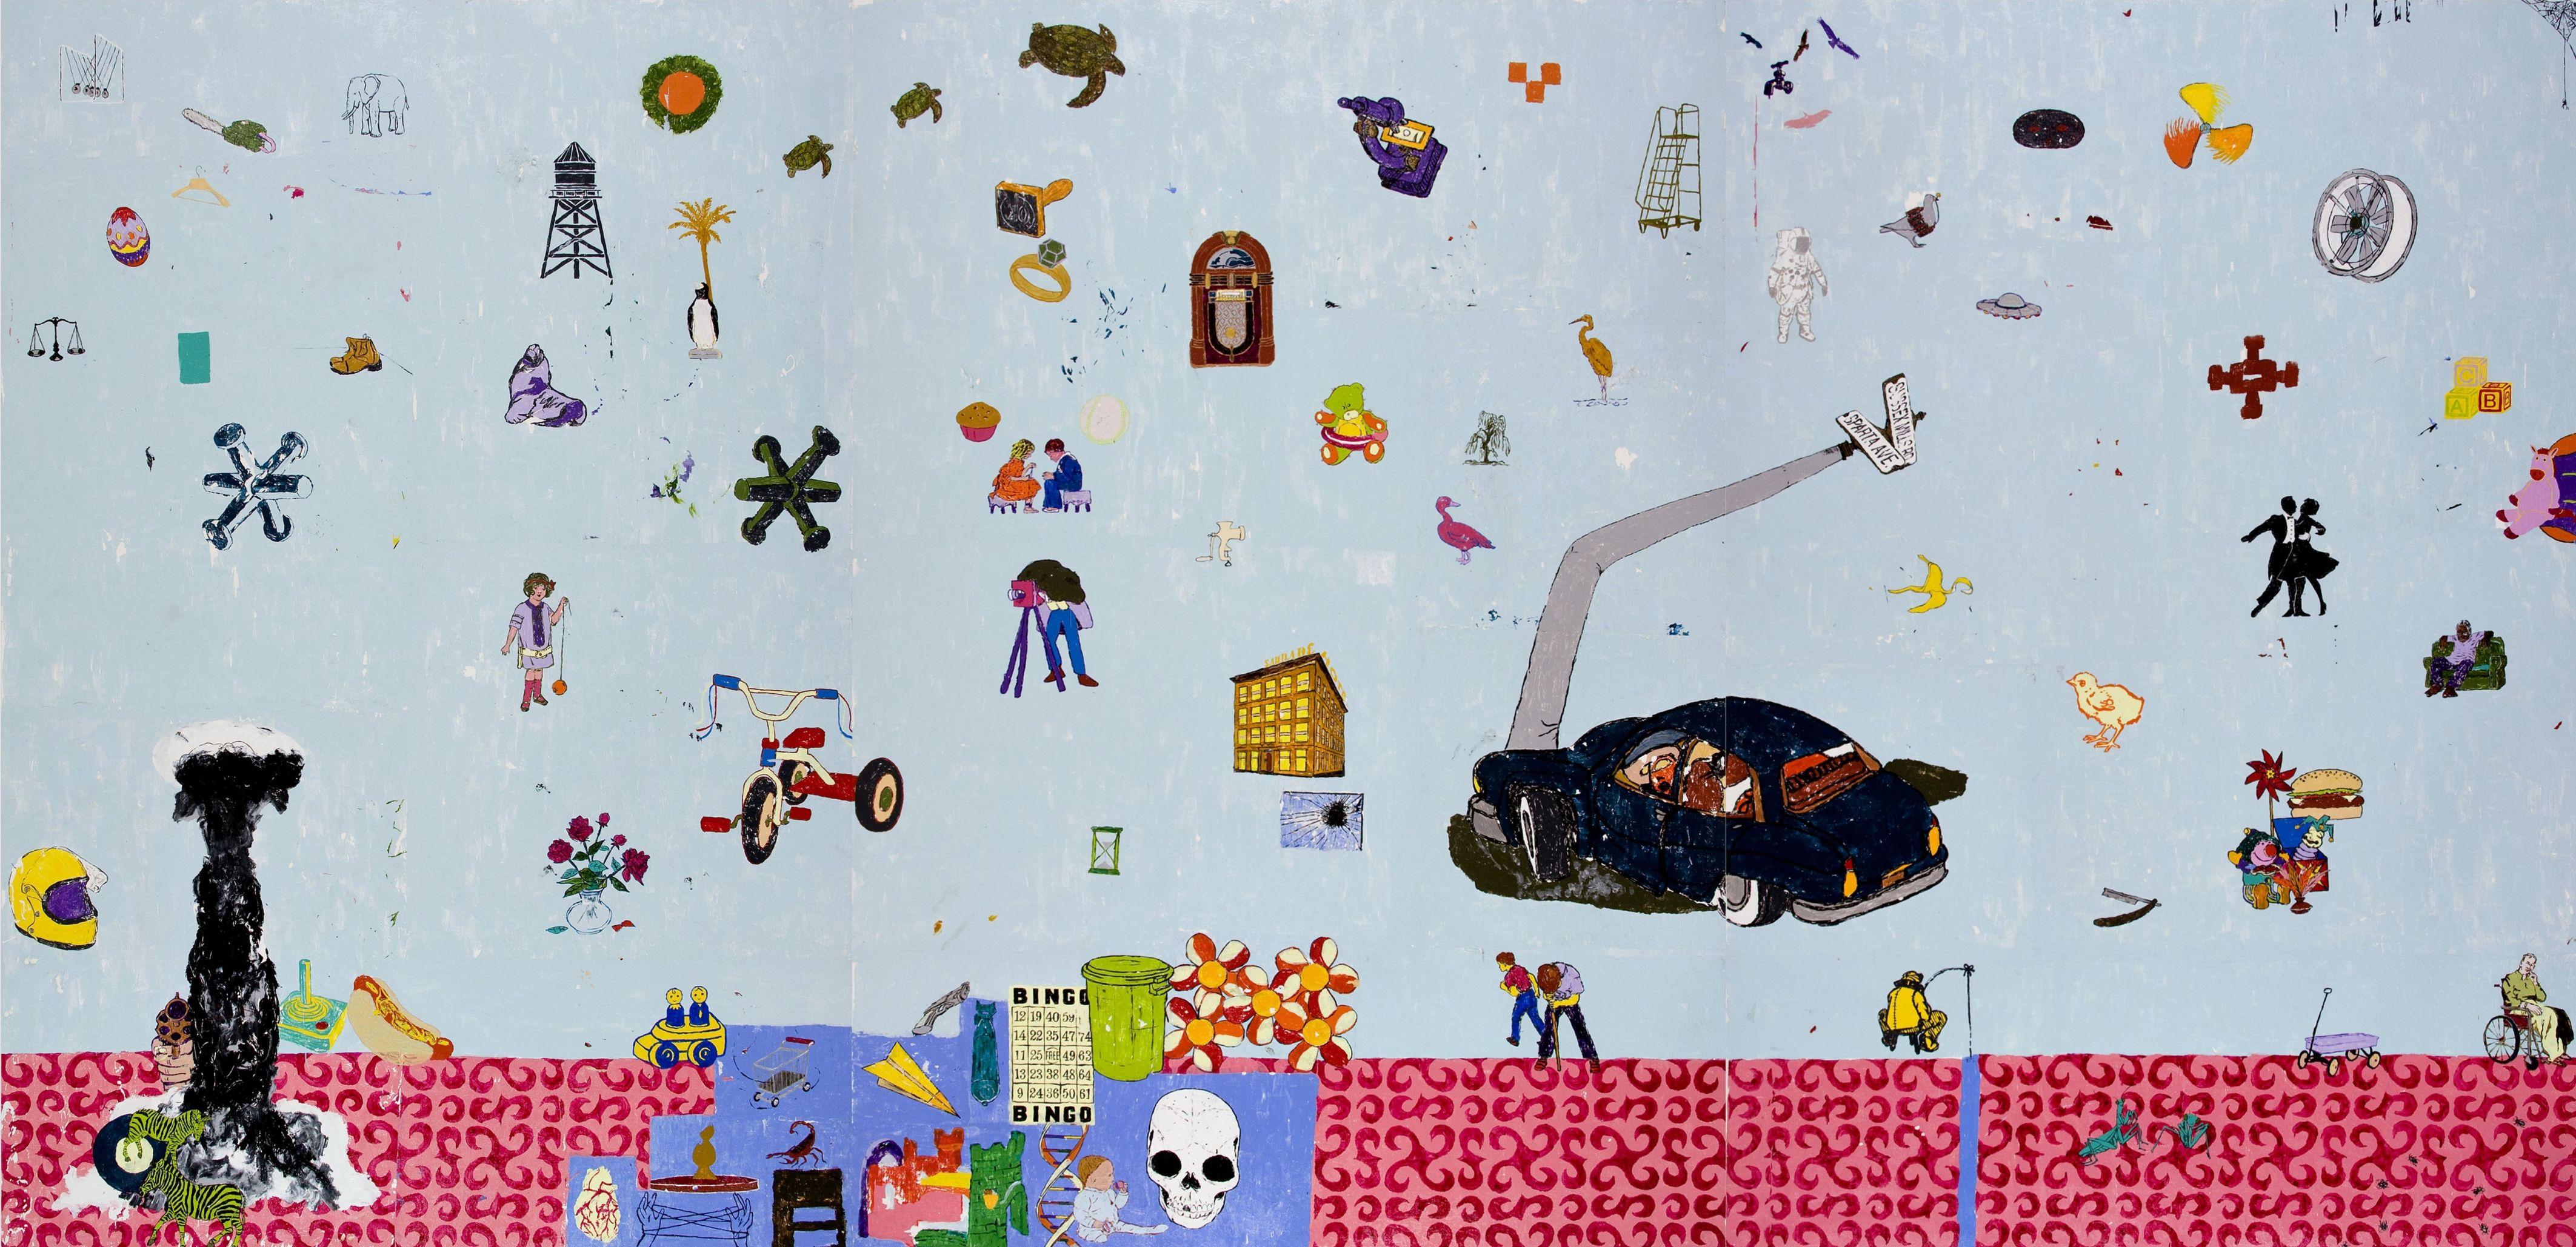 Baby's Room (2010) - Osvaldo Carvalho